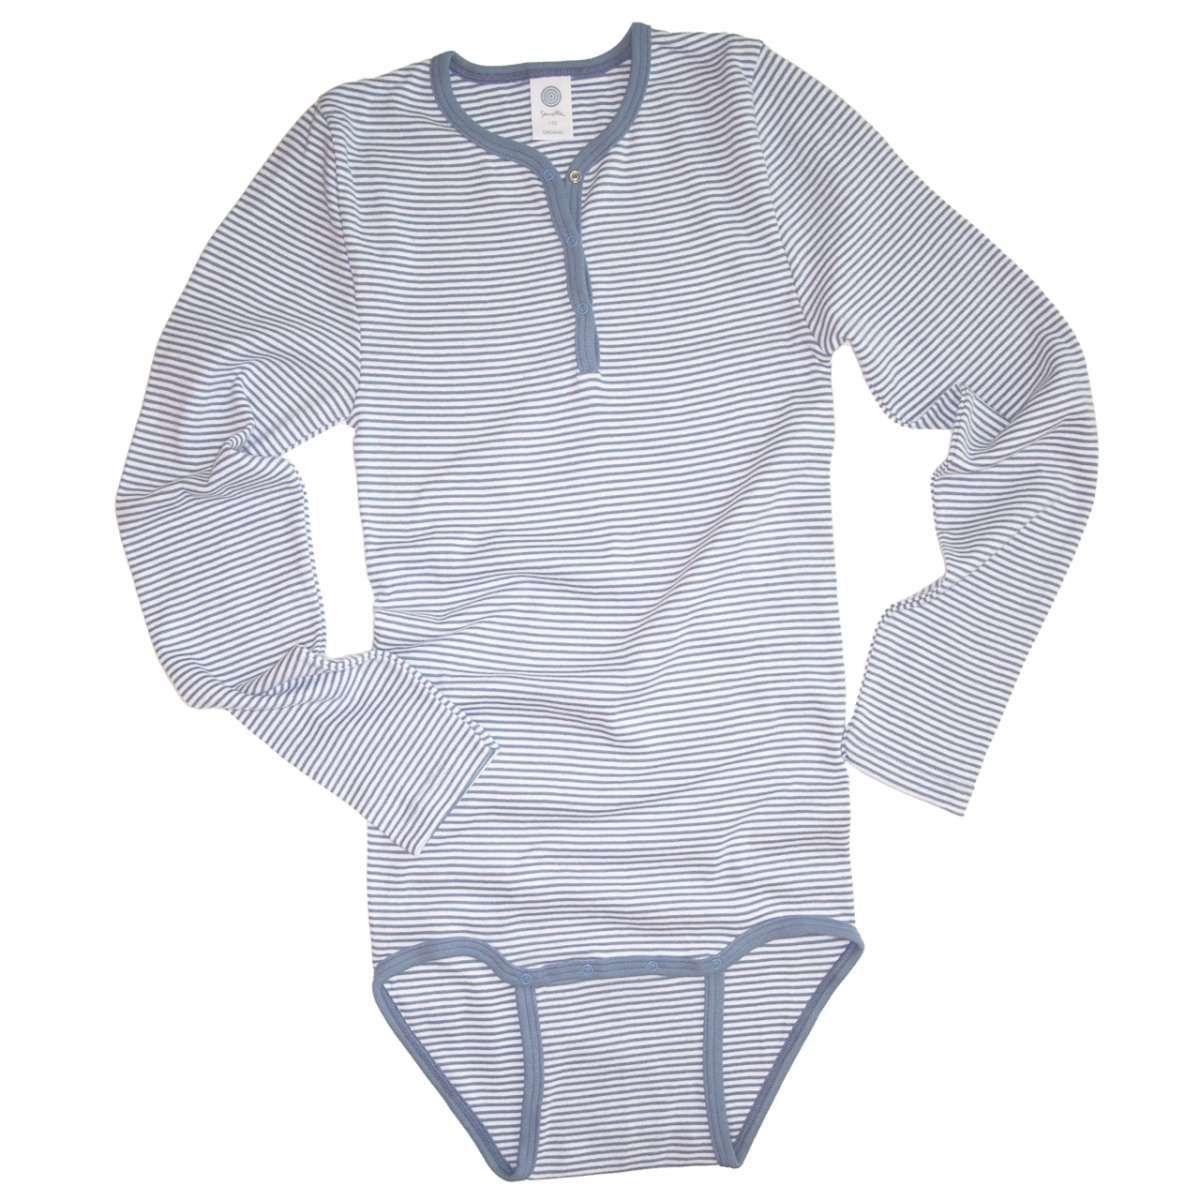 Sanetta Baby Bodysuit